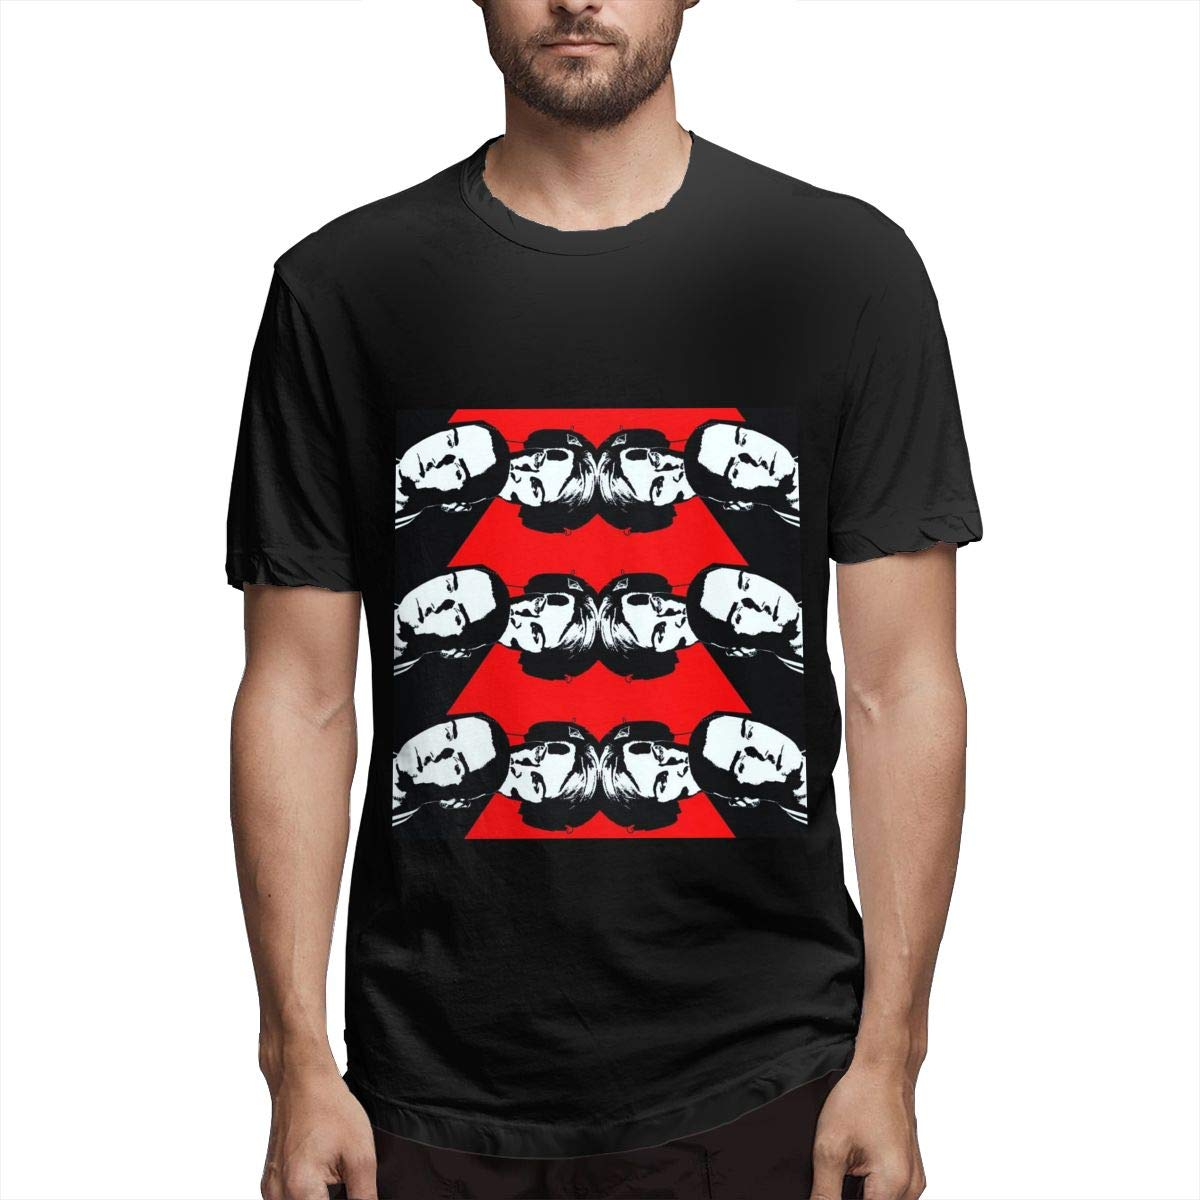 Lihehen Man Erasure Fashion Leisure Round Neck Tees Shirts